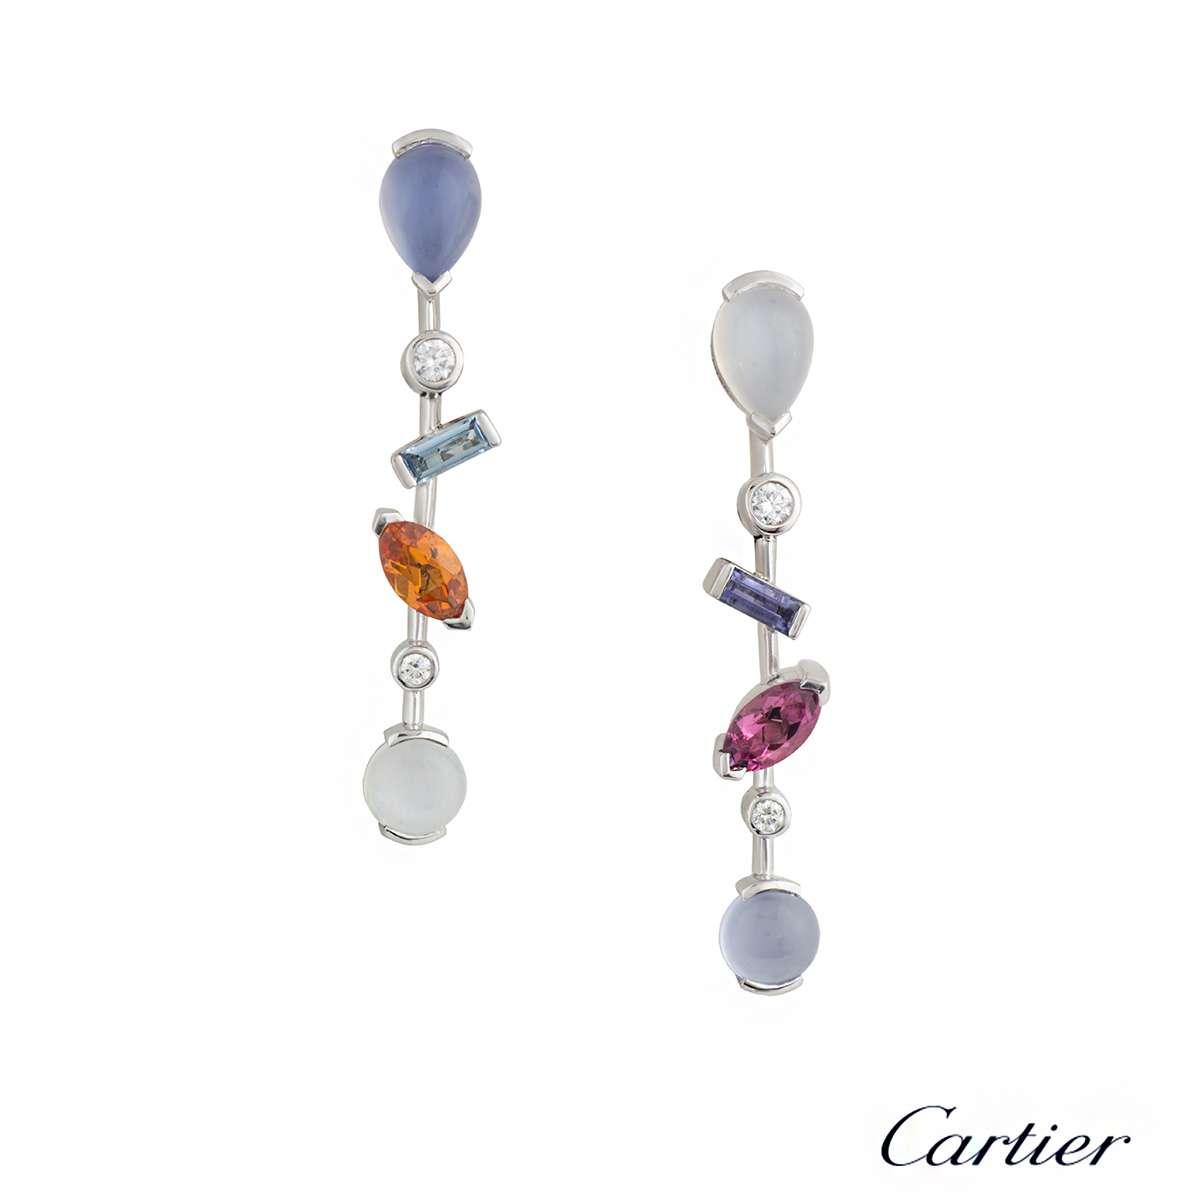 Cartier Meli Melo Multi Gem Set Platinum Earrings